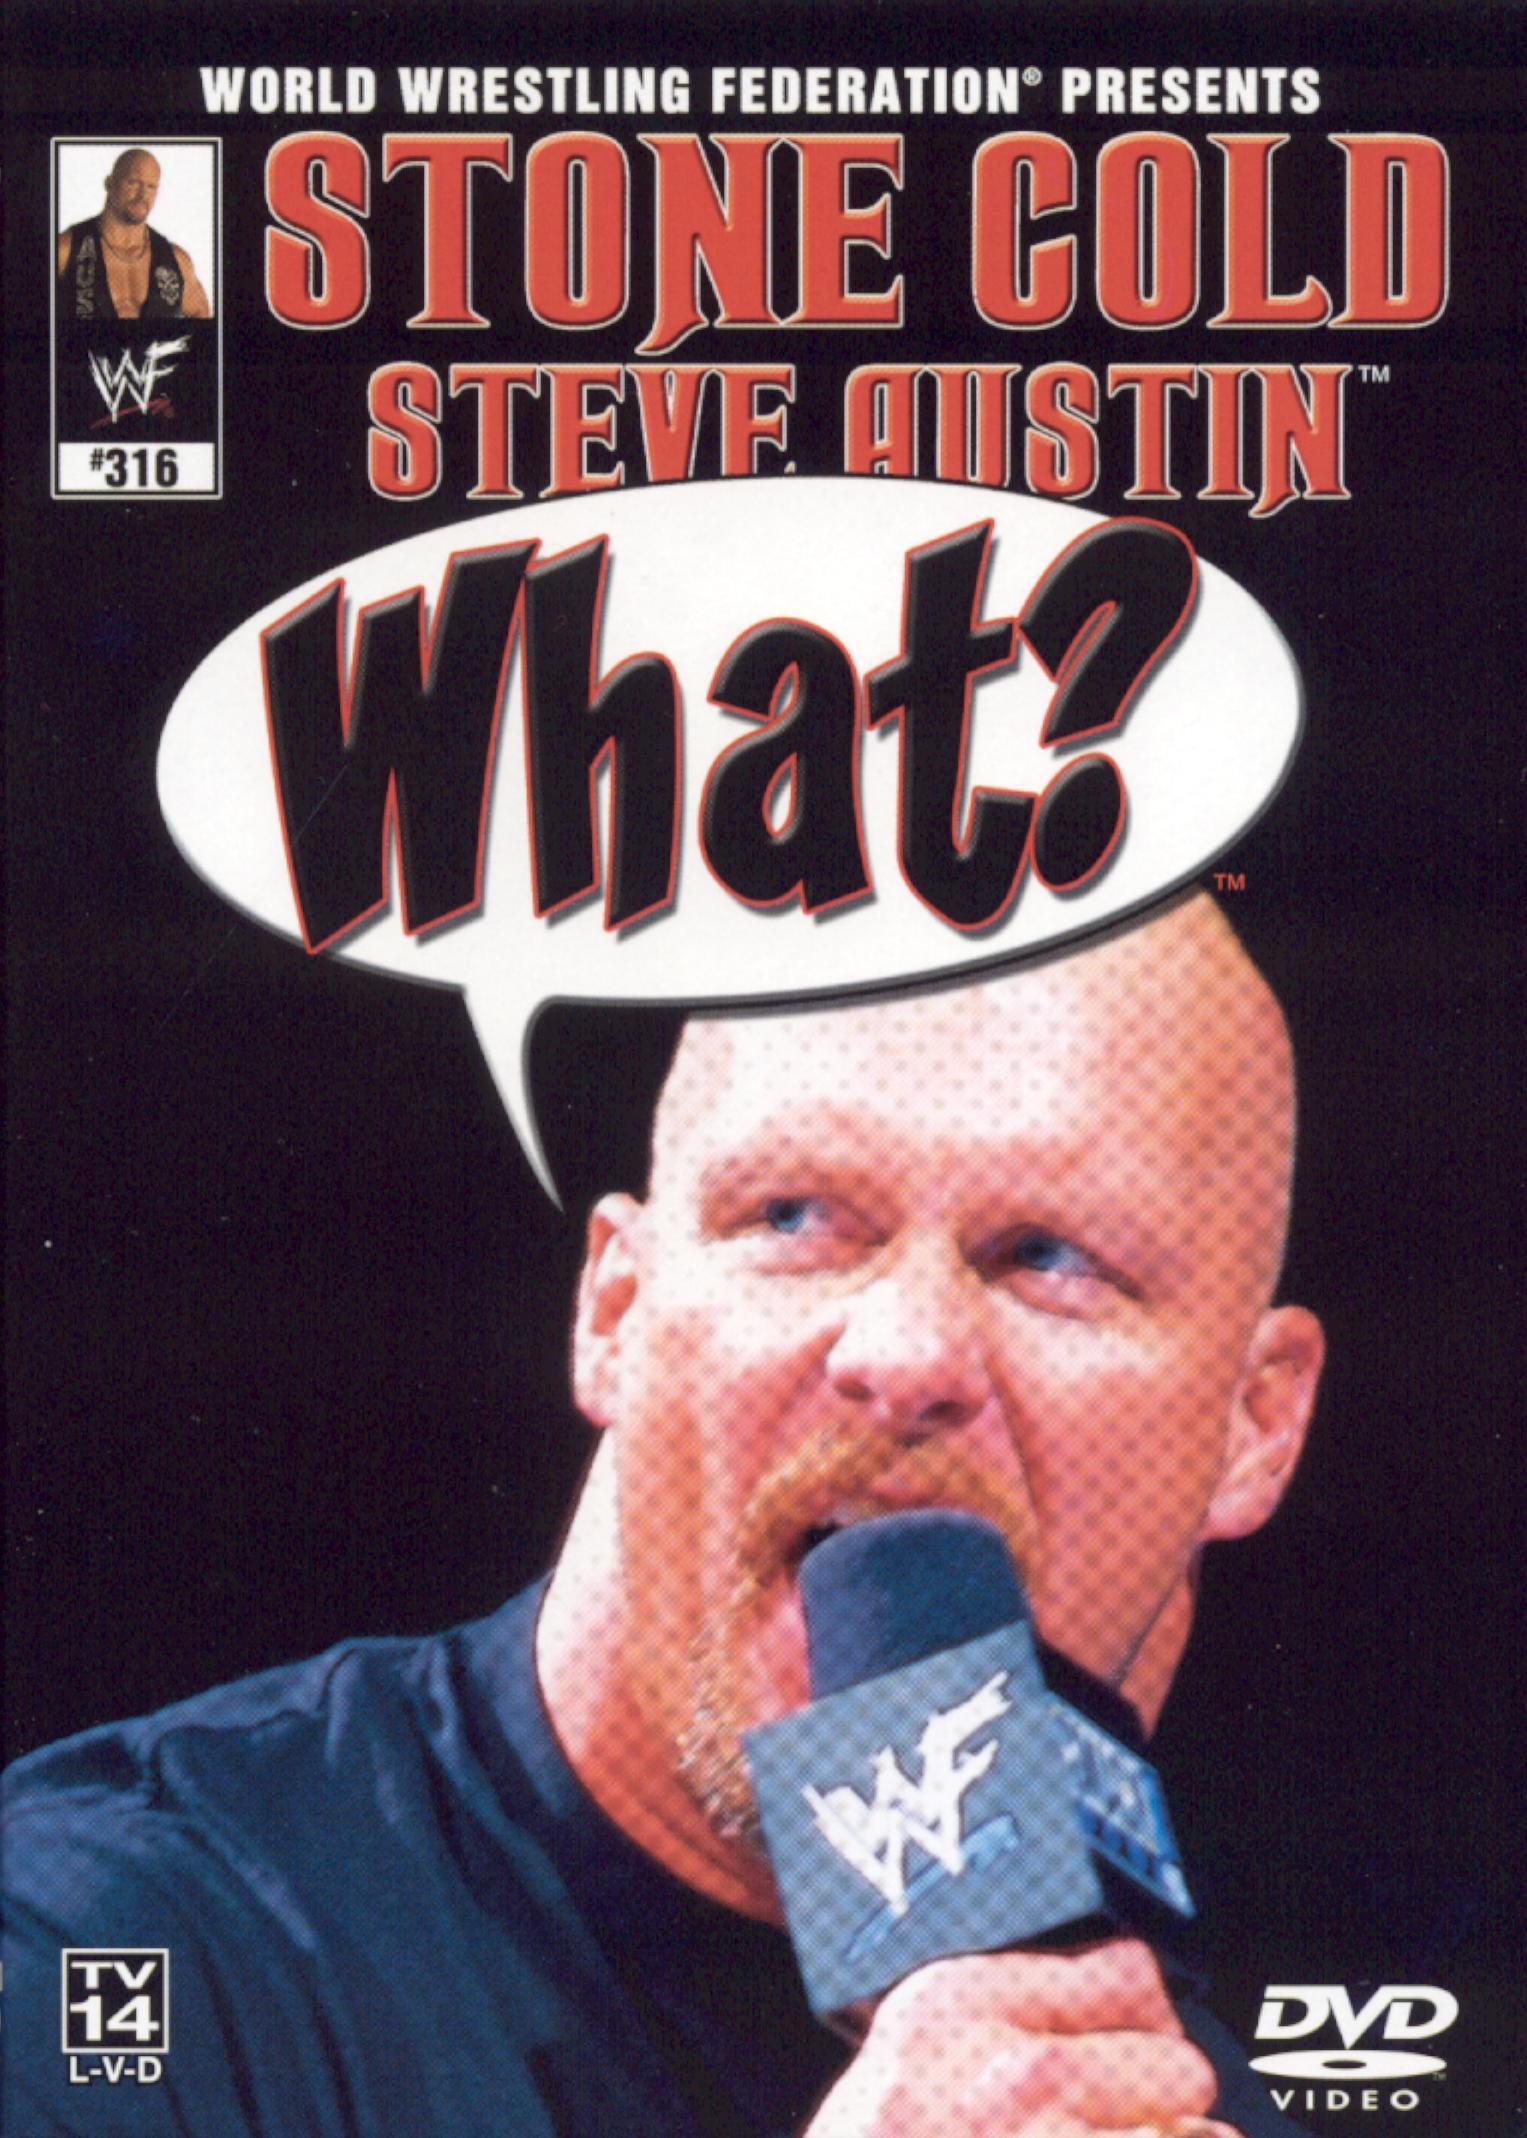 WWF: Stone Cold Steve Austin - What?